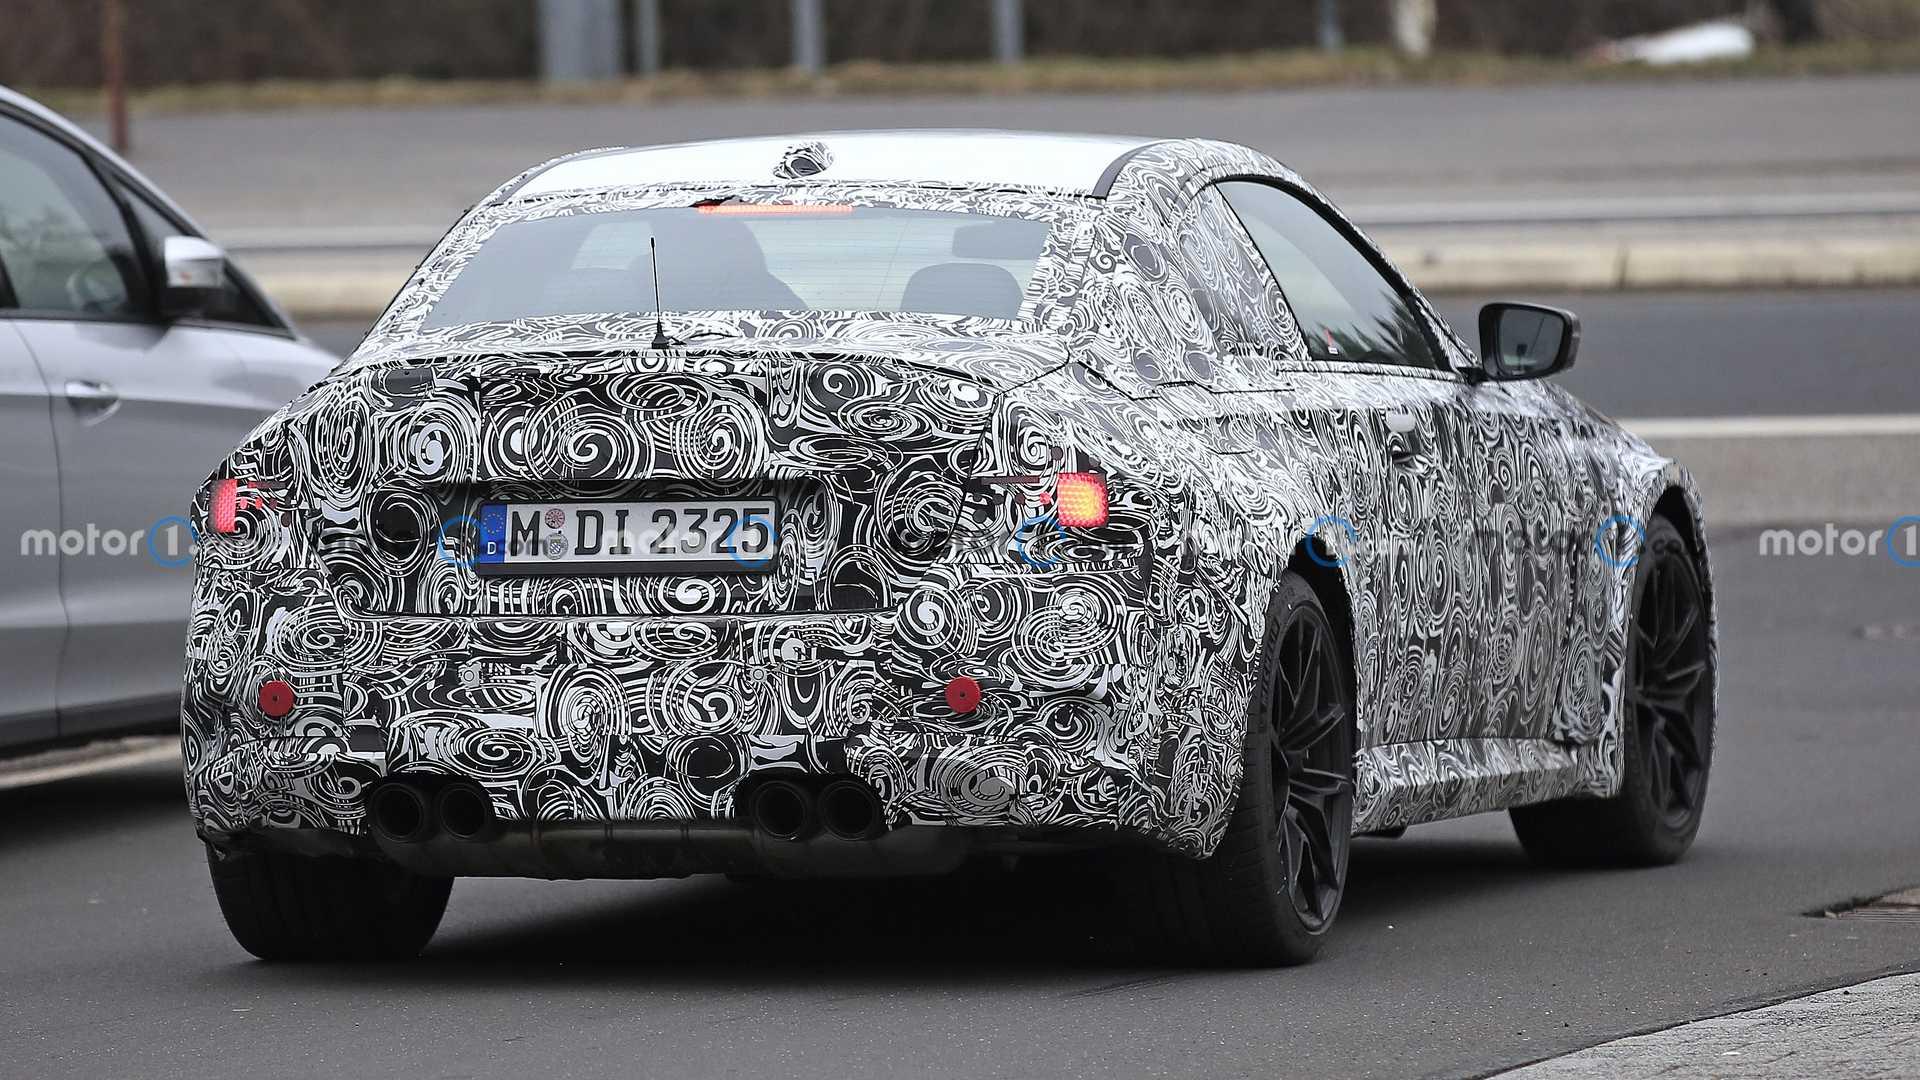 全新M2 Coupe即将量产,2022上市